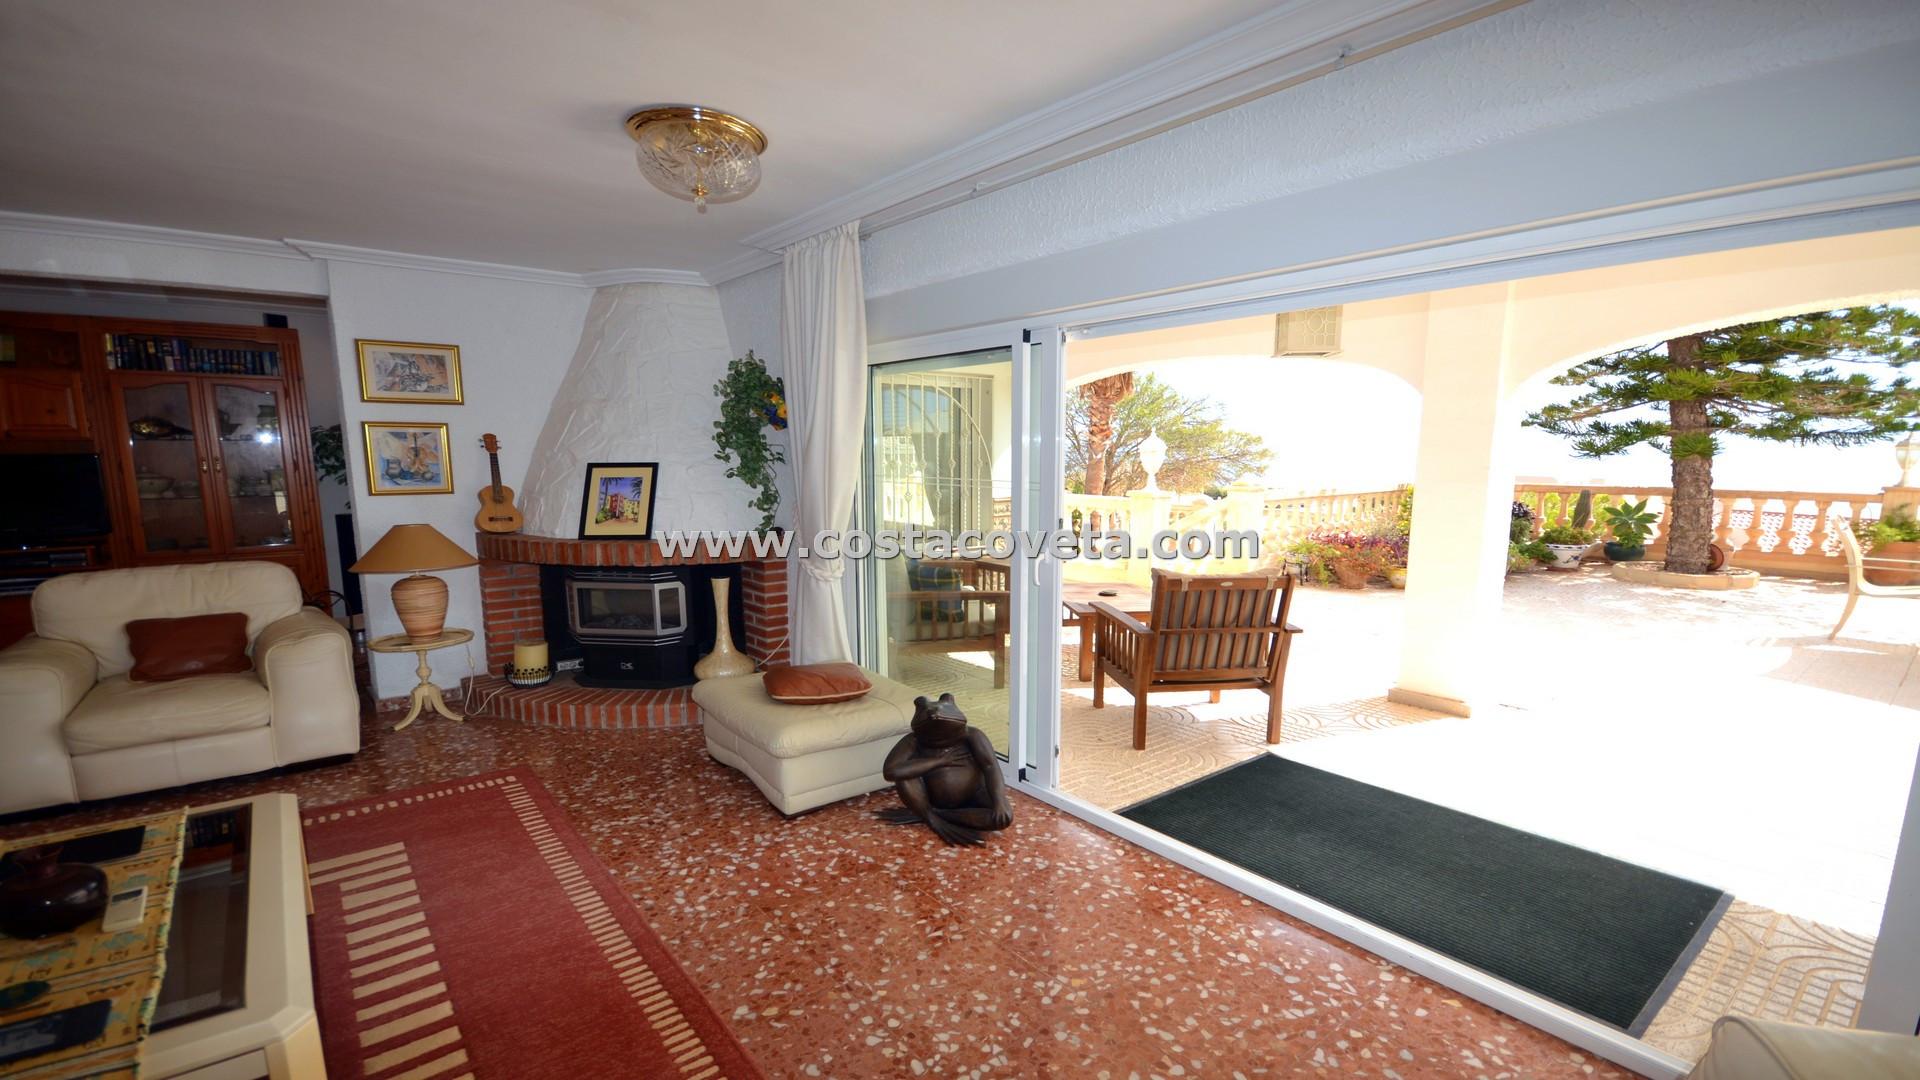 Wonderful detached villa with pool and amazing sea views in la Coveta Fuma